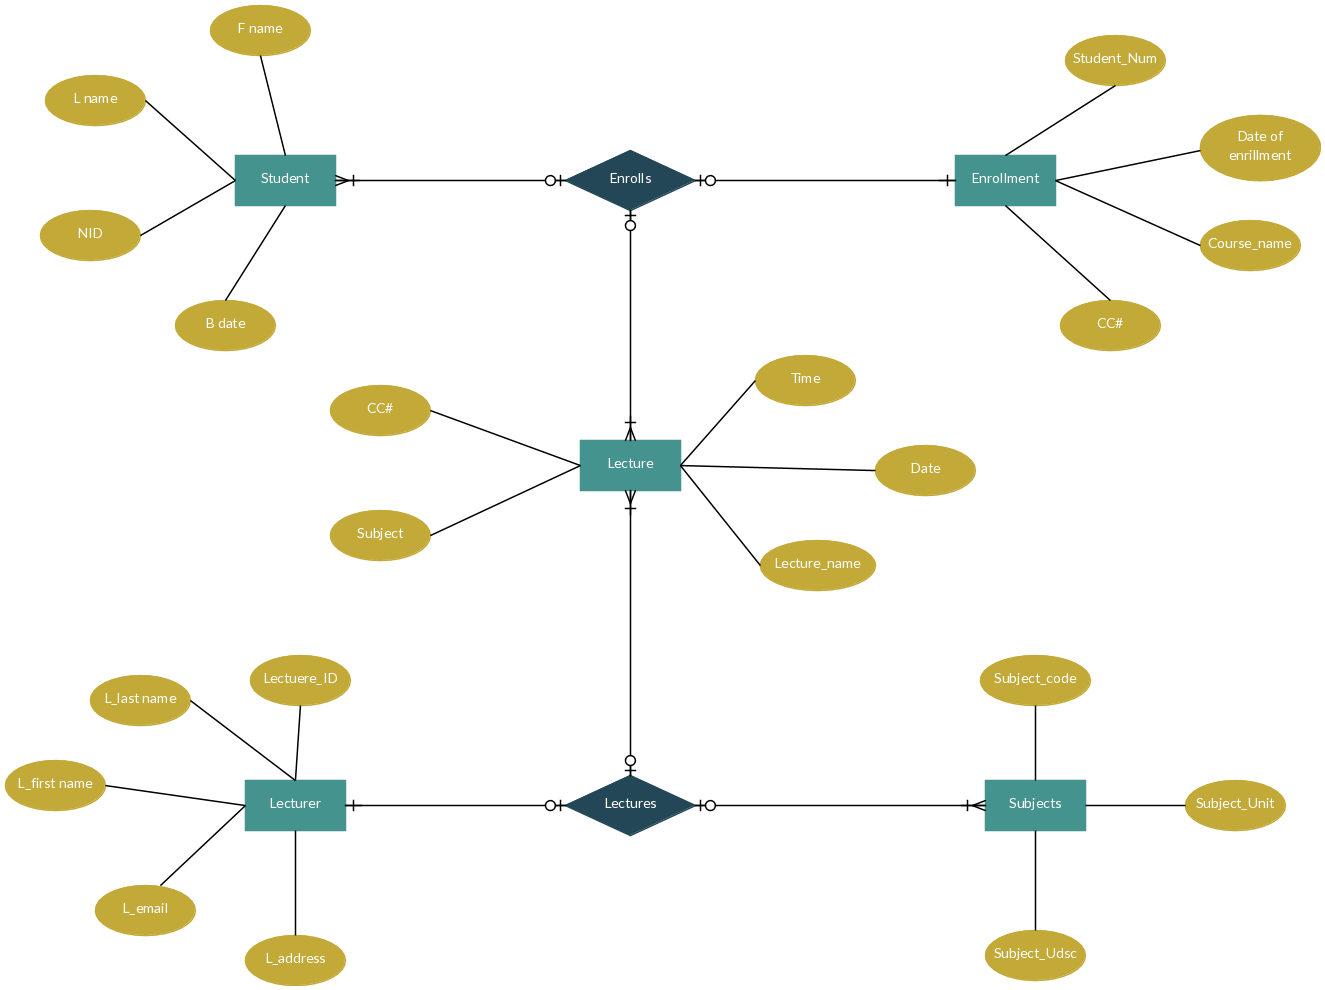 Entity Relationship Diagram For Collage Enrollment System